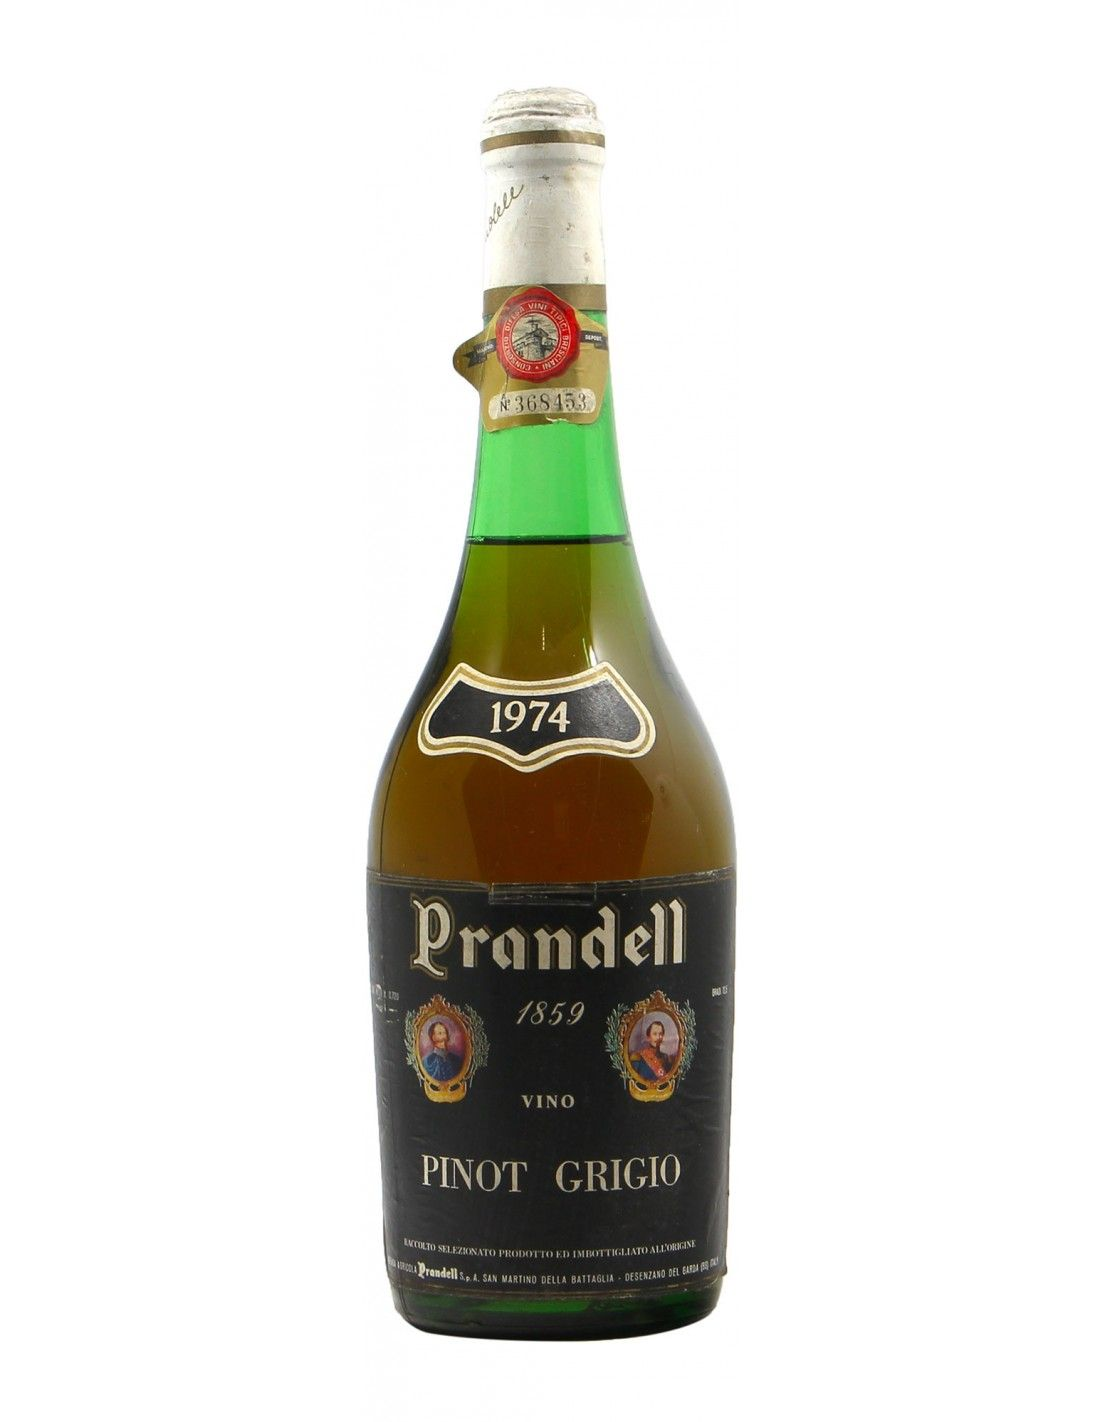 Pinot Grigio 1974 PRANDELL GRANDI BOTTIGLIE